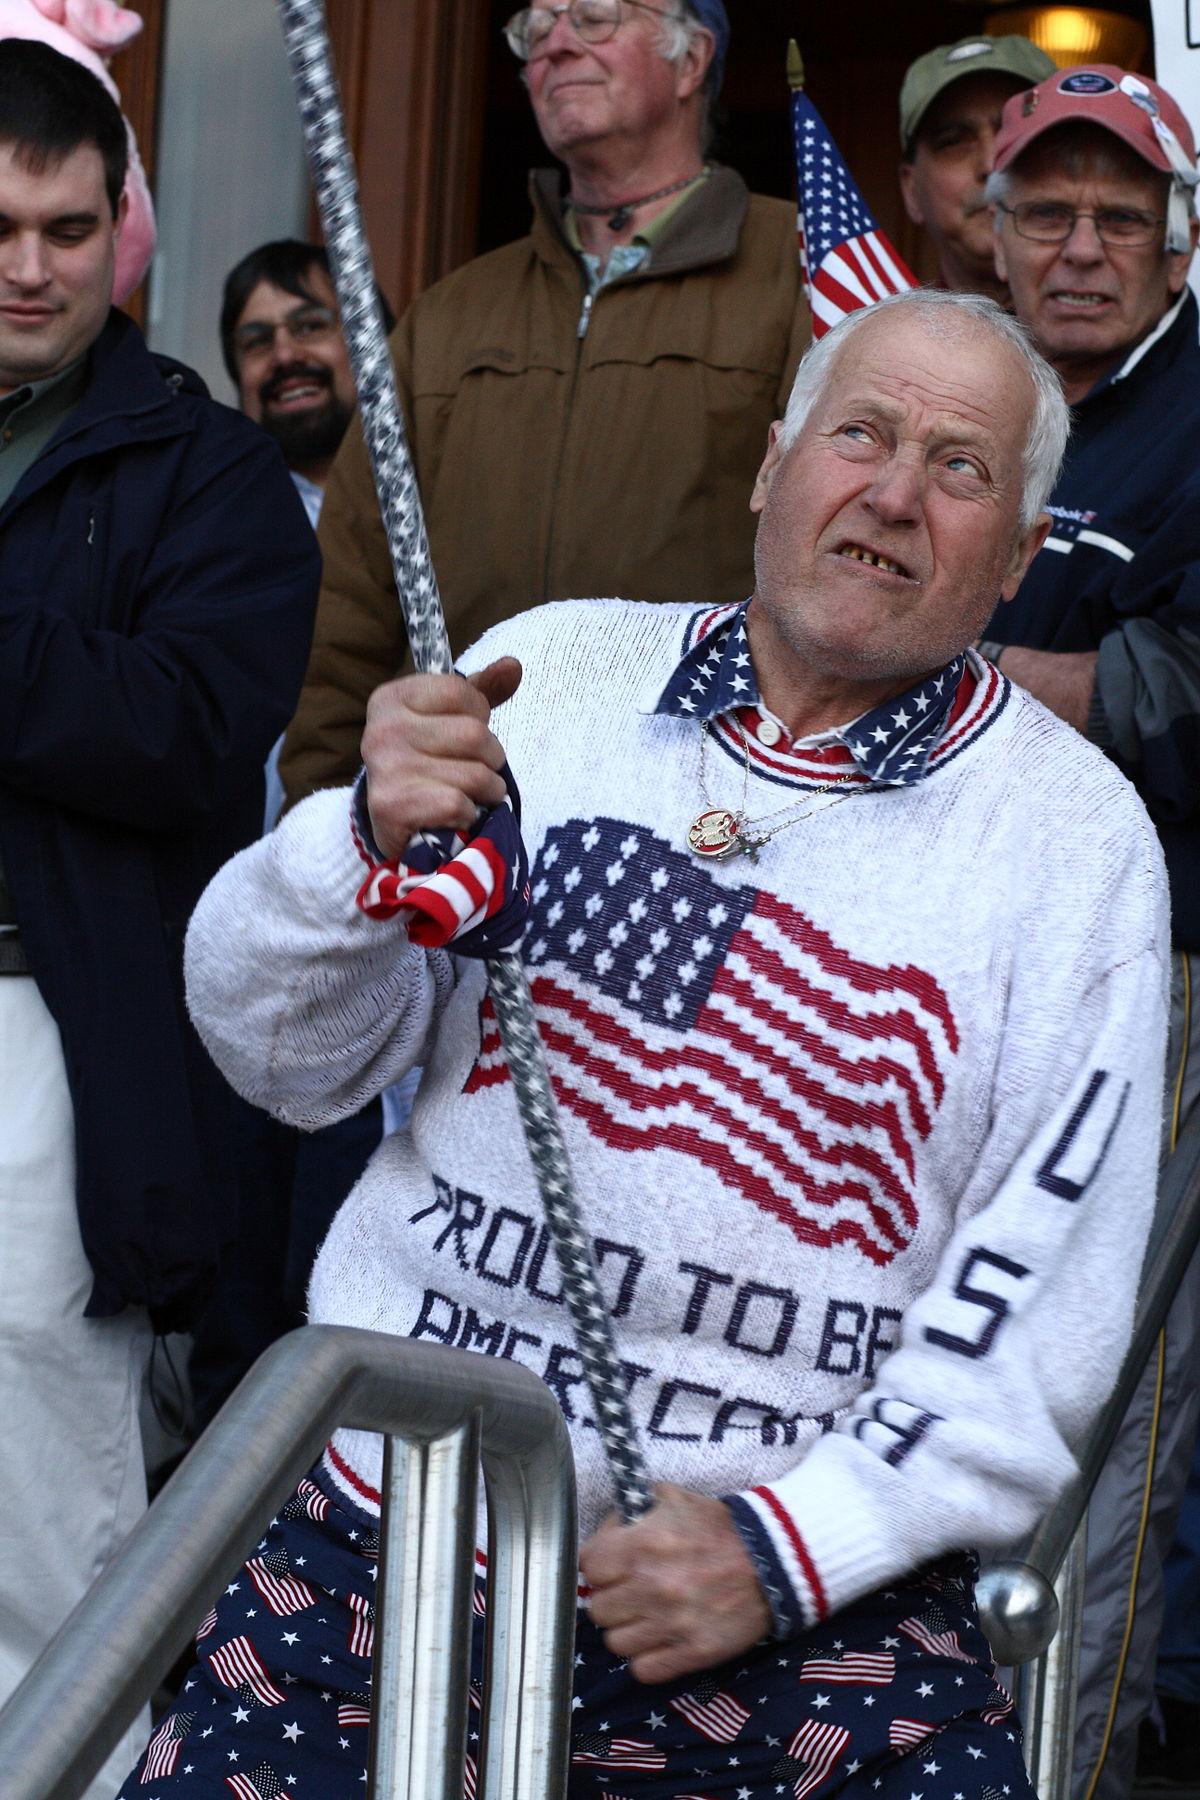 Flag waver - Wikipedia